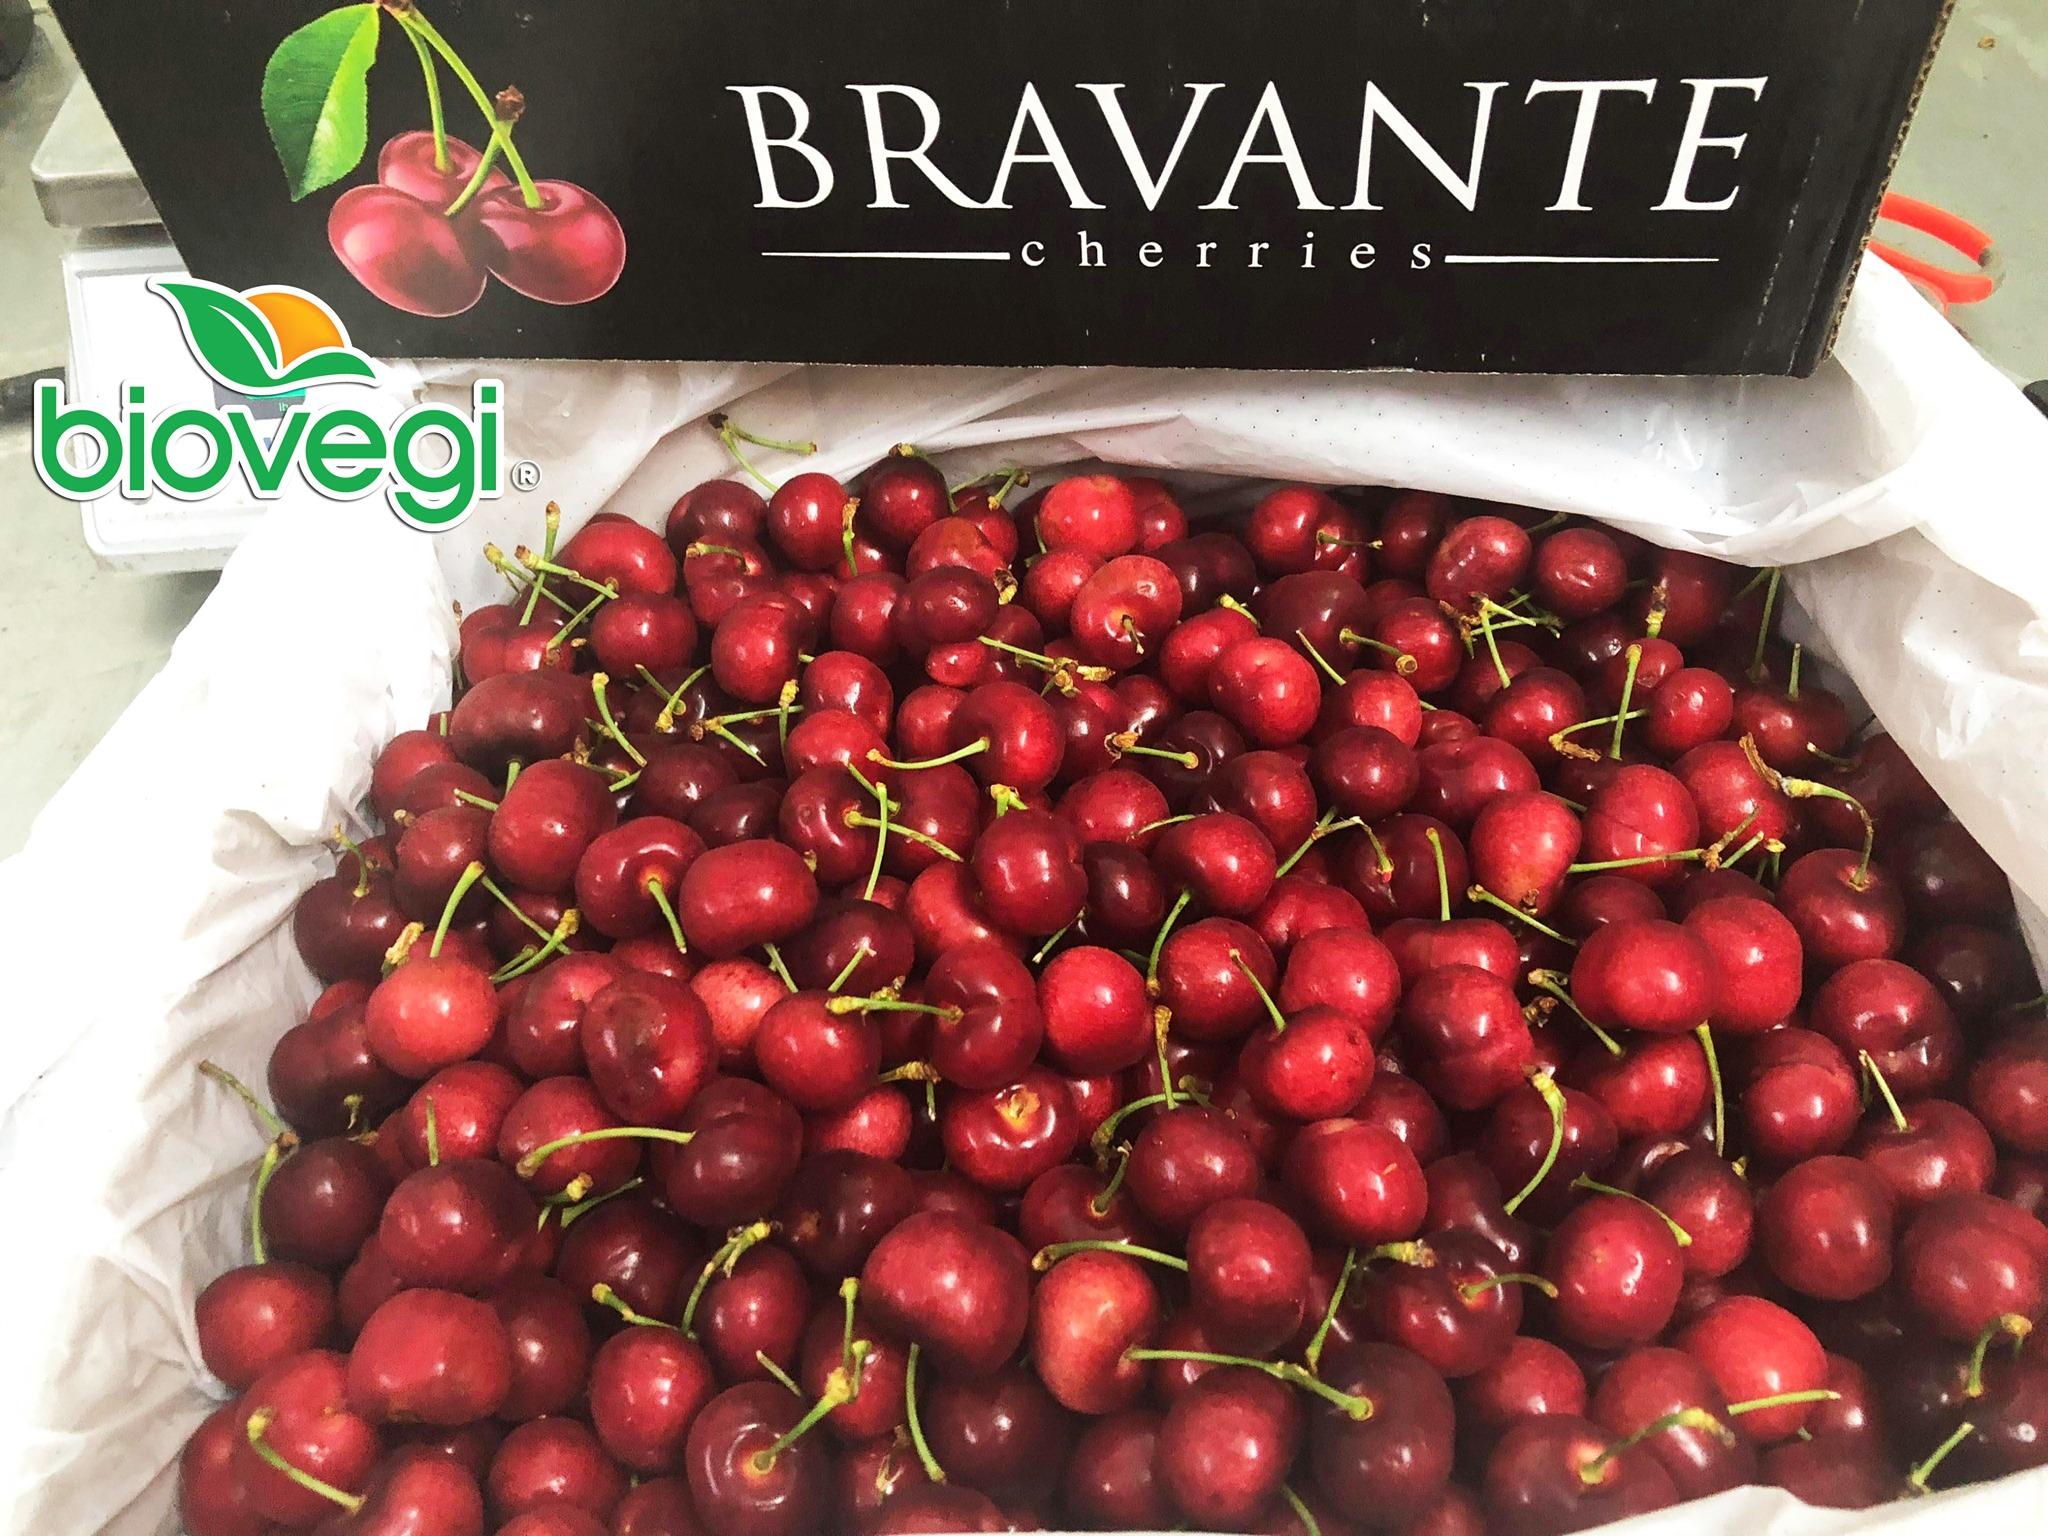 Cherry Mỹ Bravante